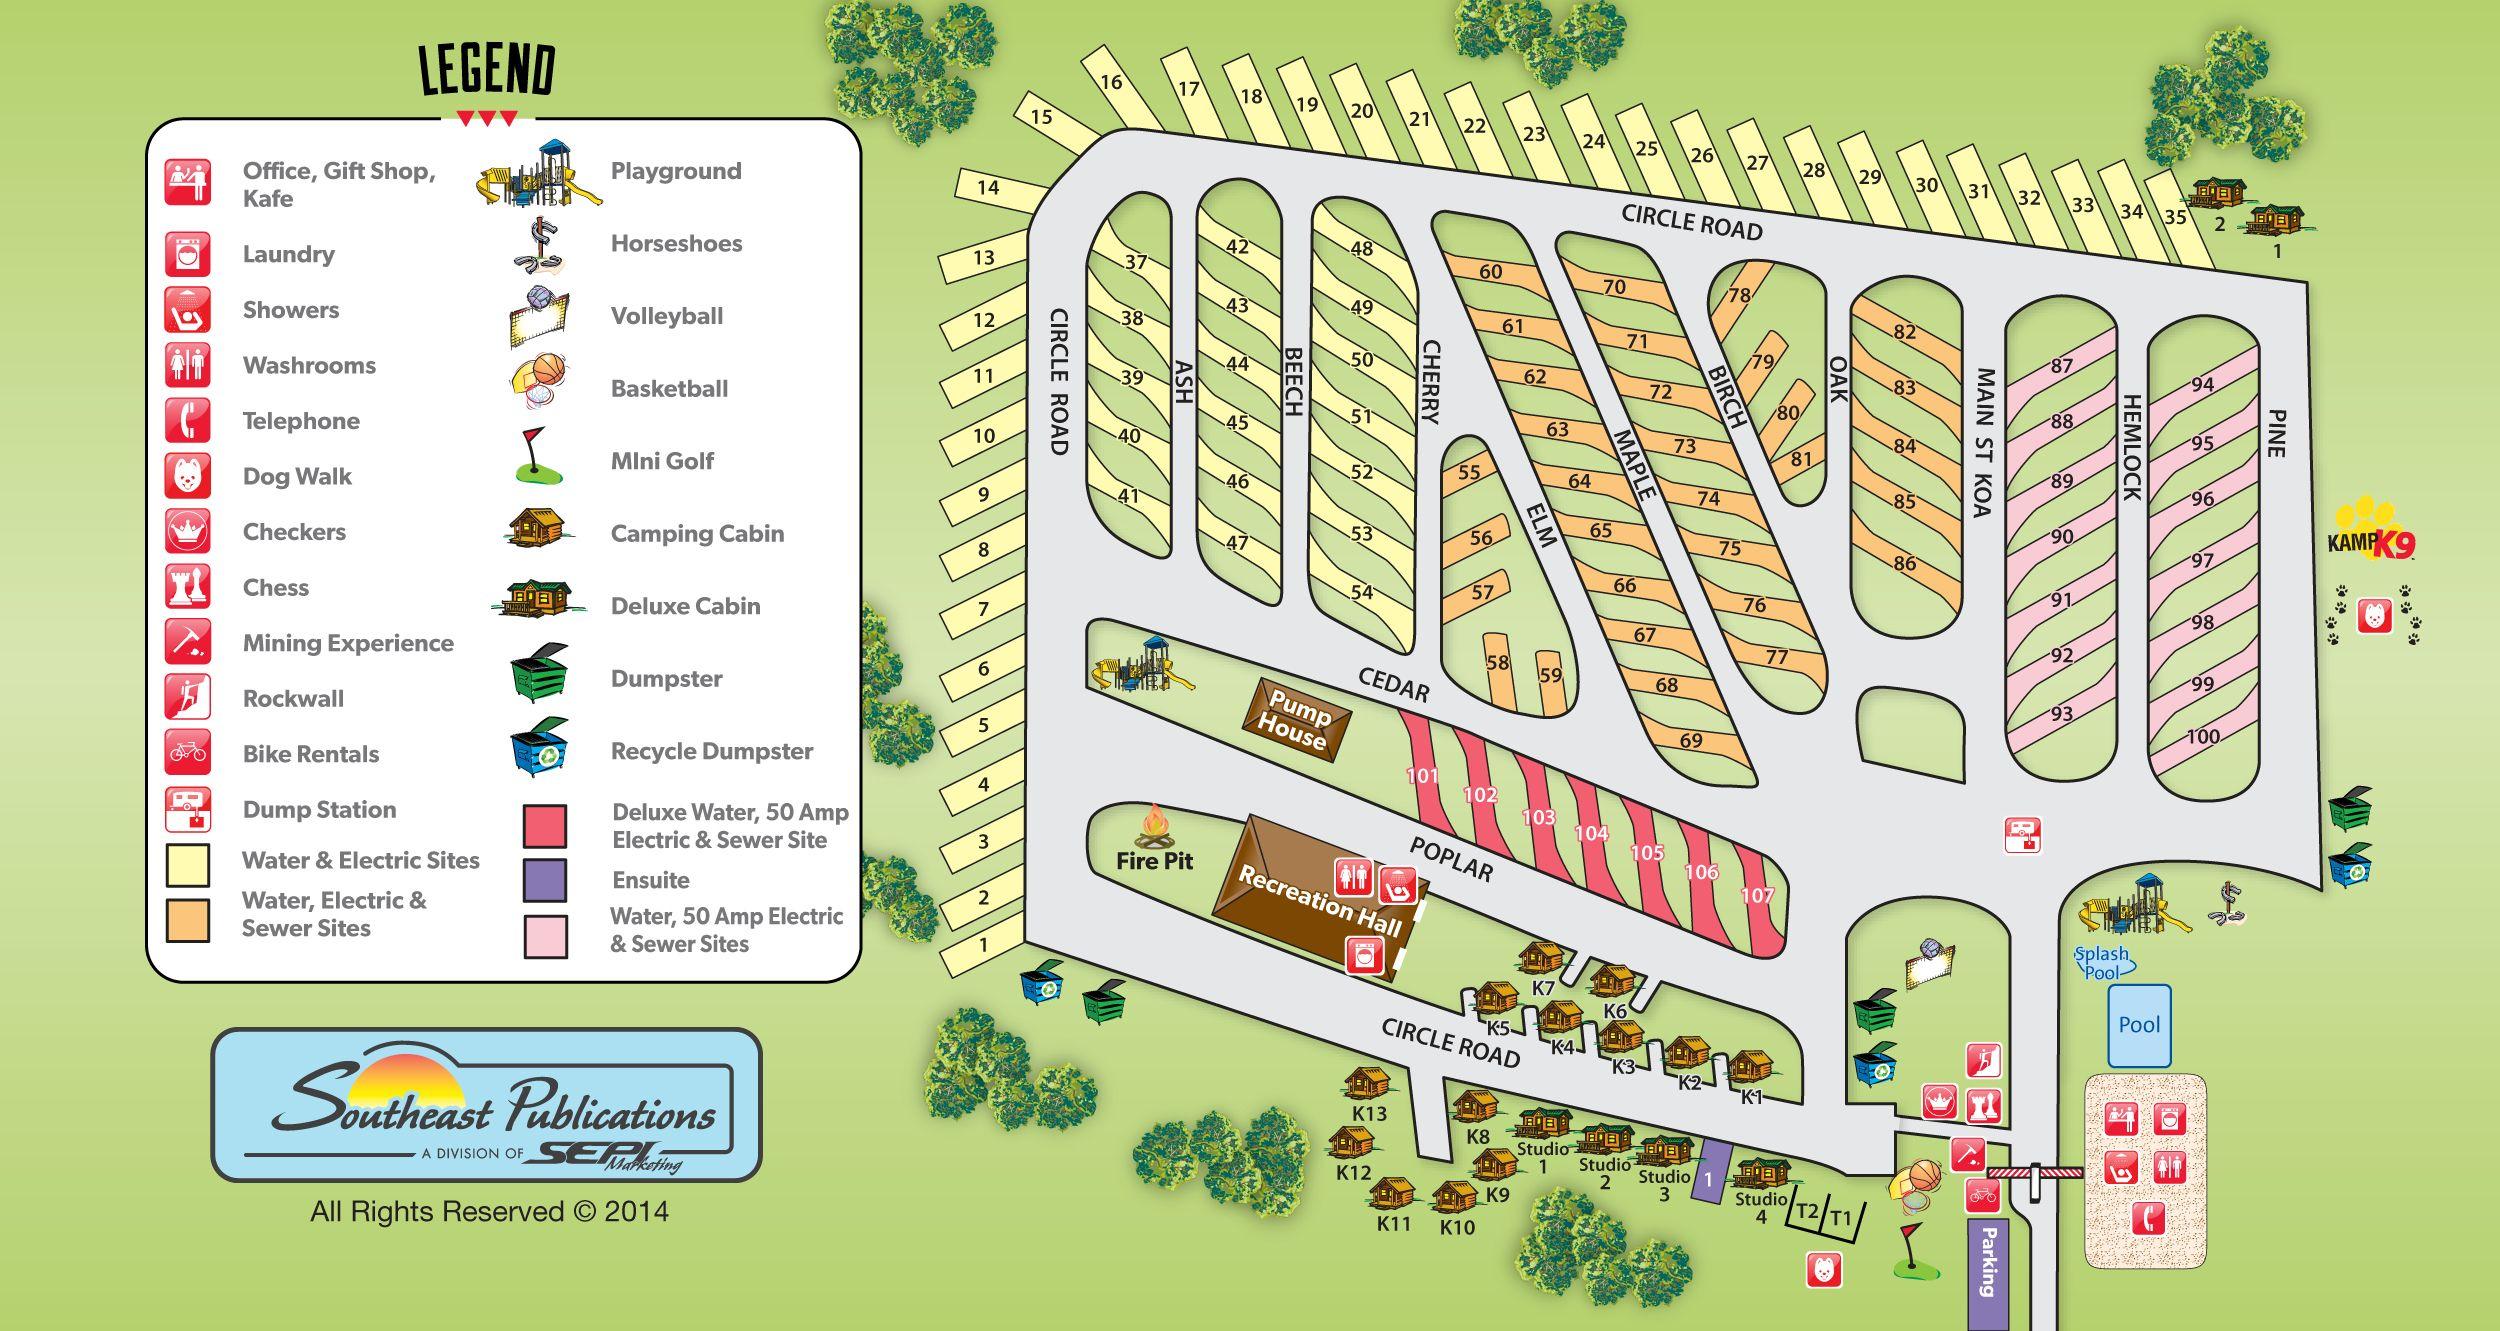 TORONTO NORTH COOKSTOWN KOA Campground Site Map Camping - Koa us map